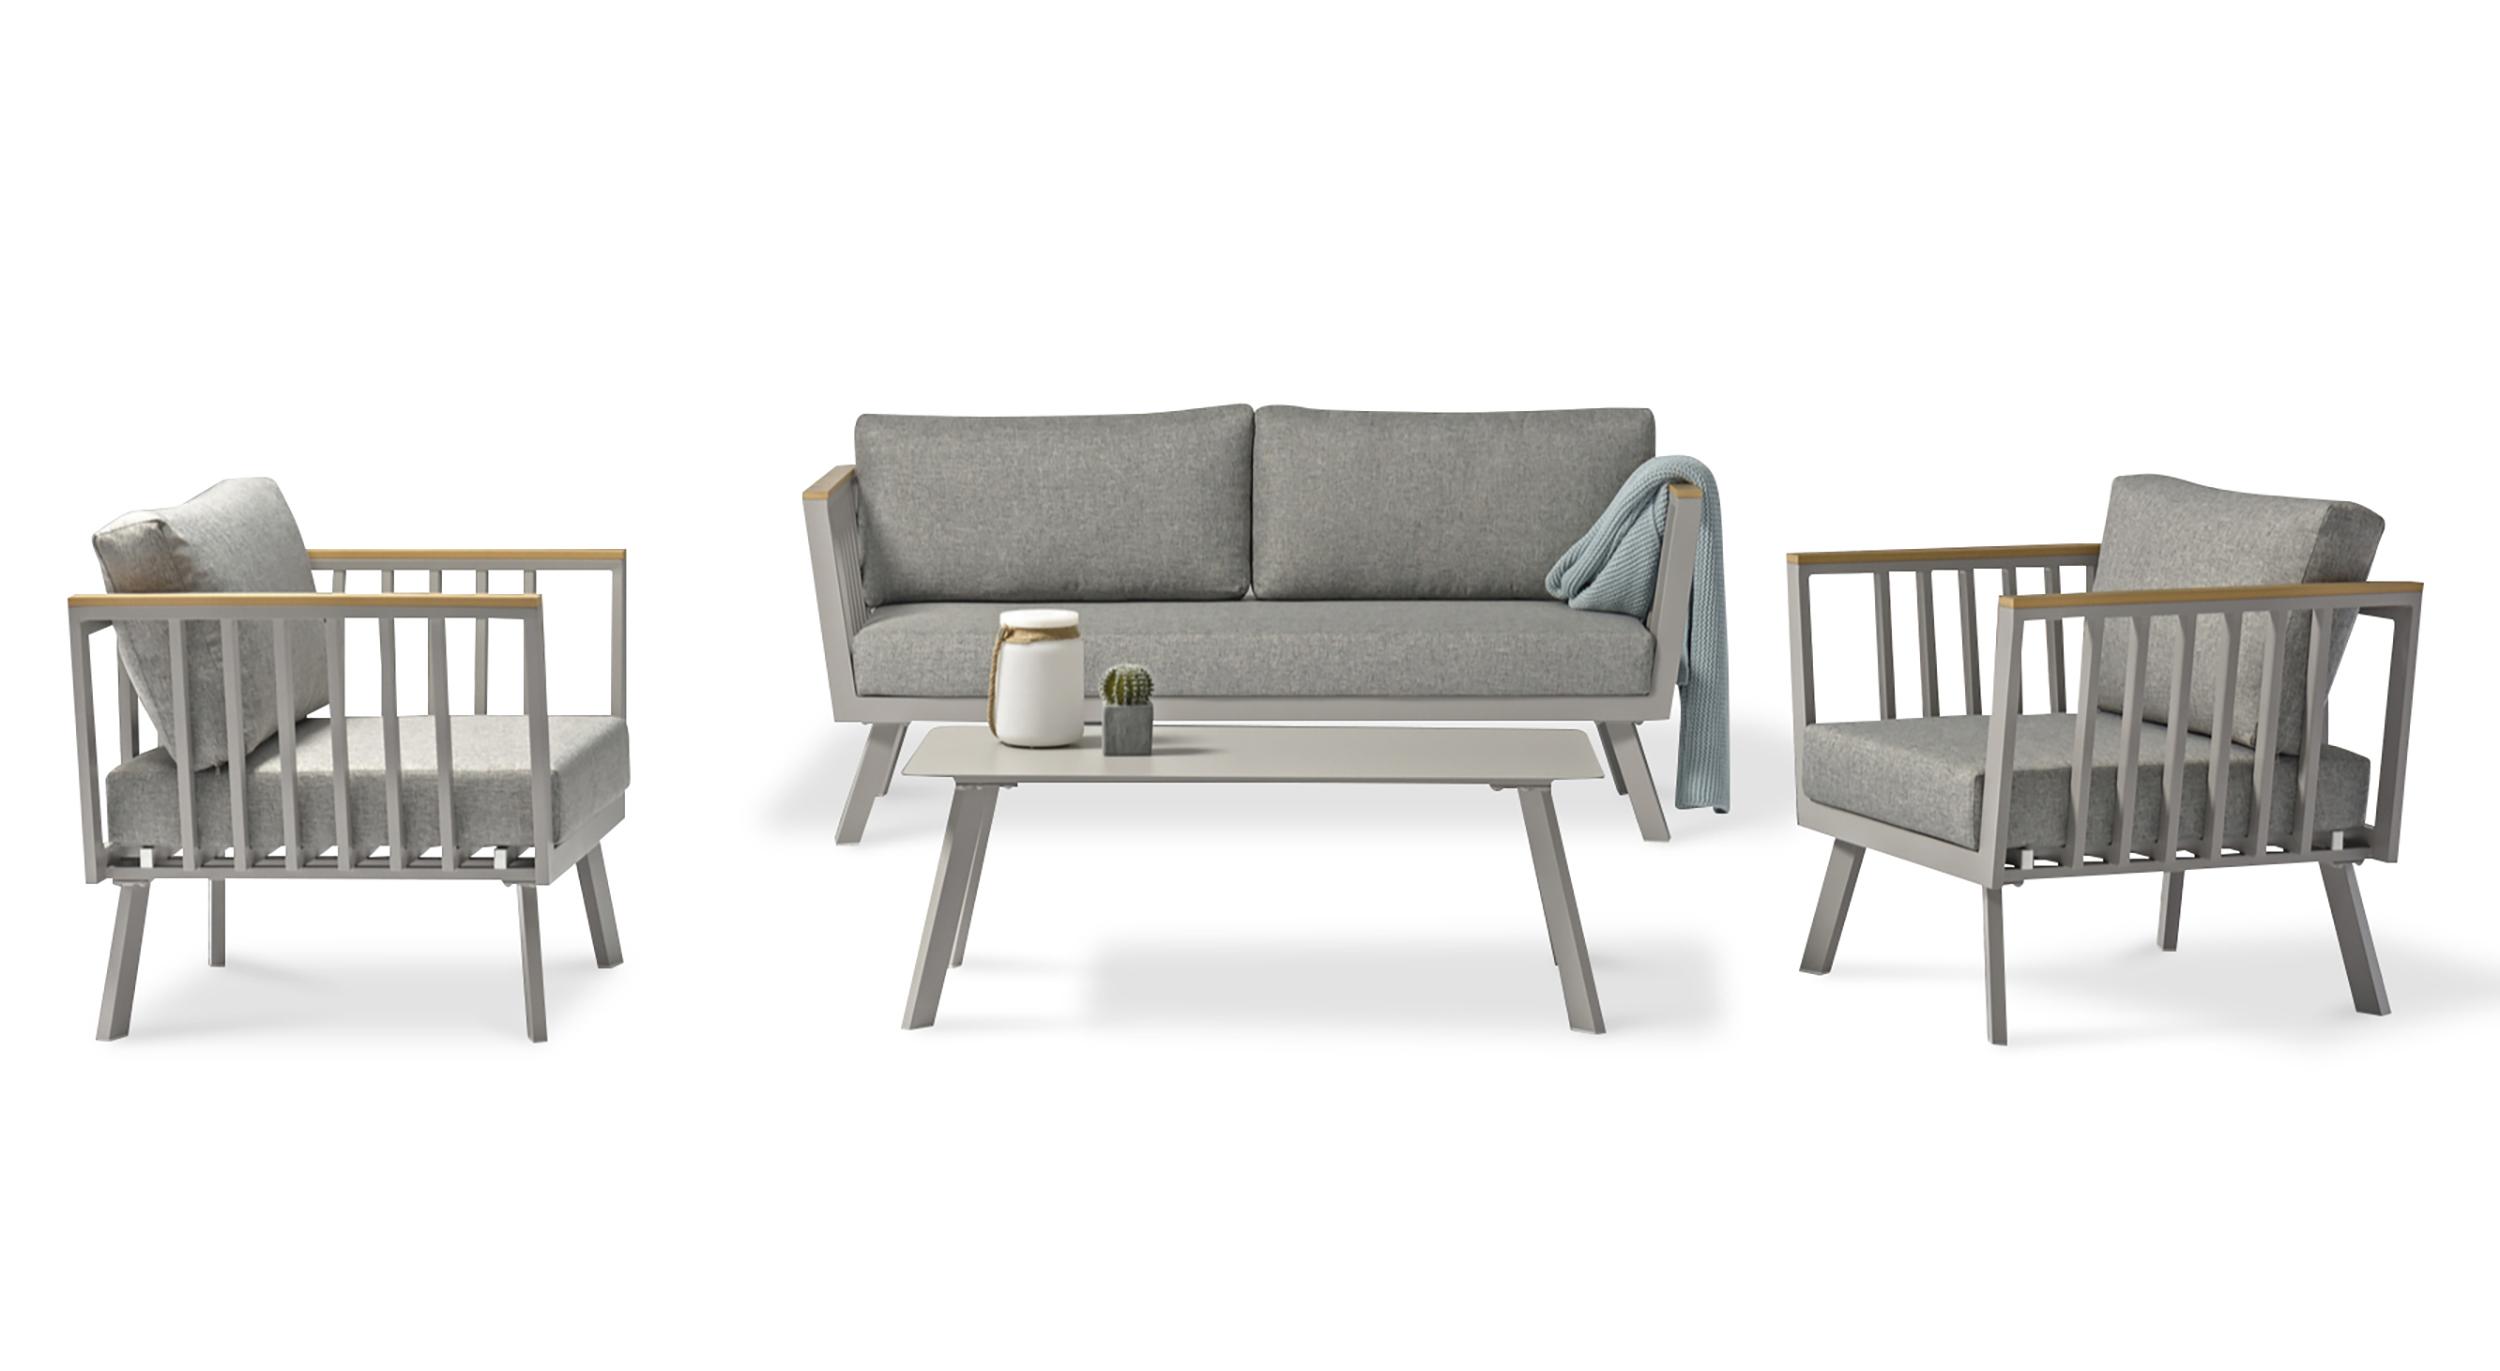 Salon de jardin 5 places en aluminium gris